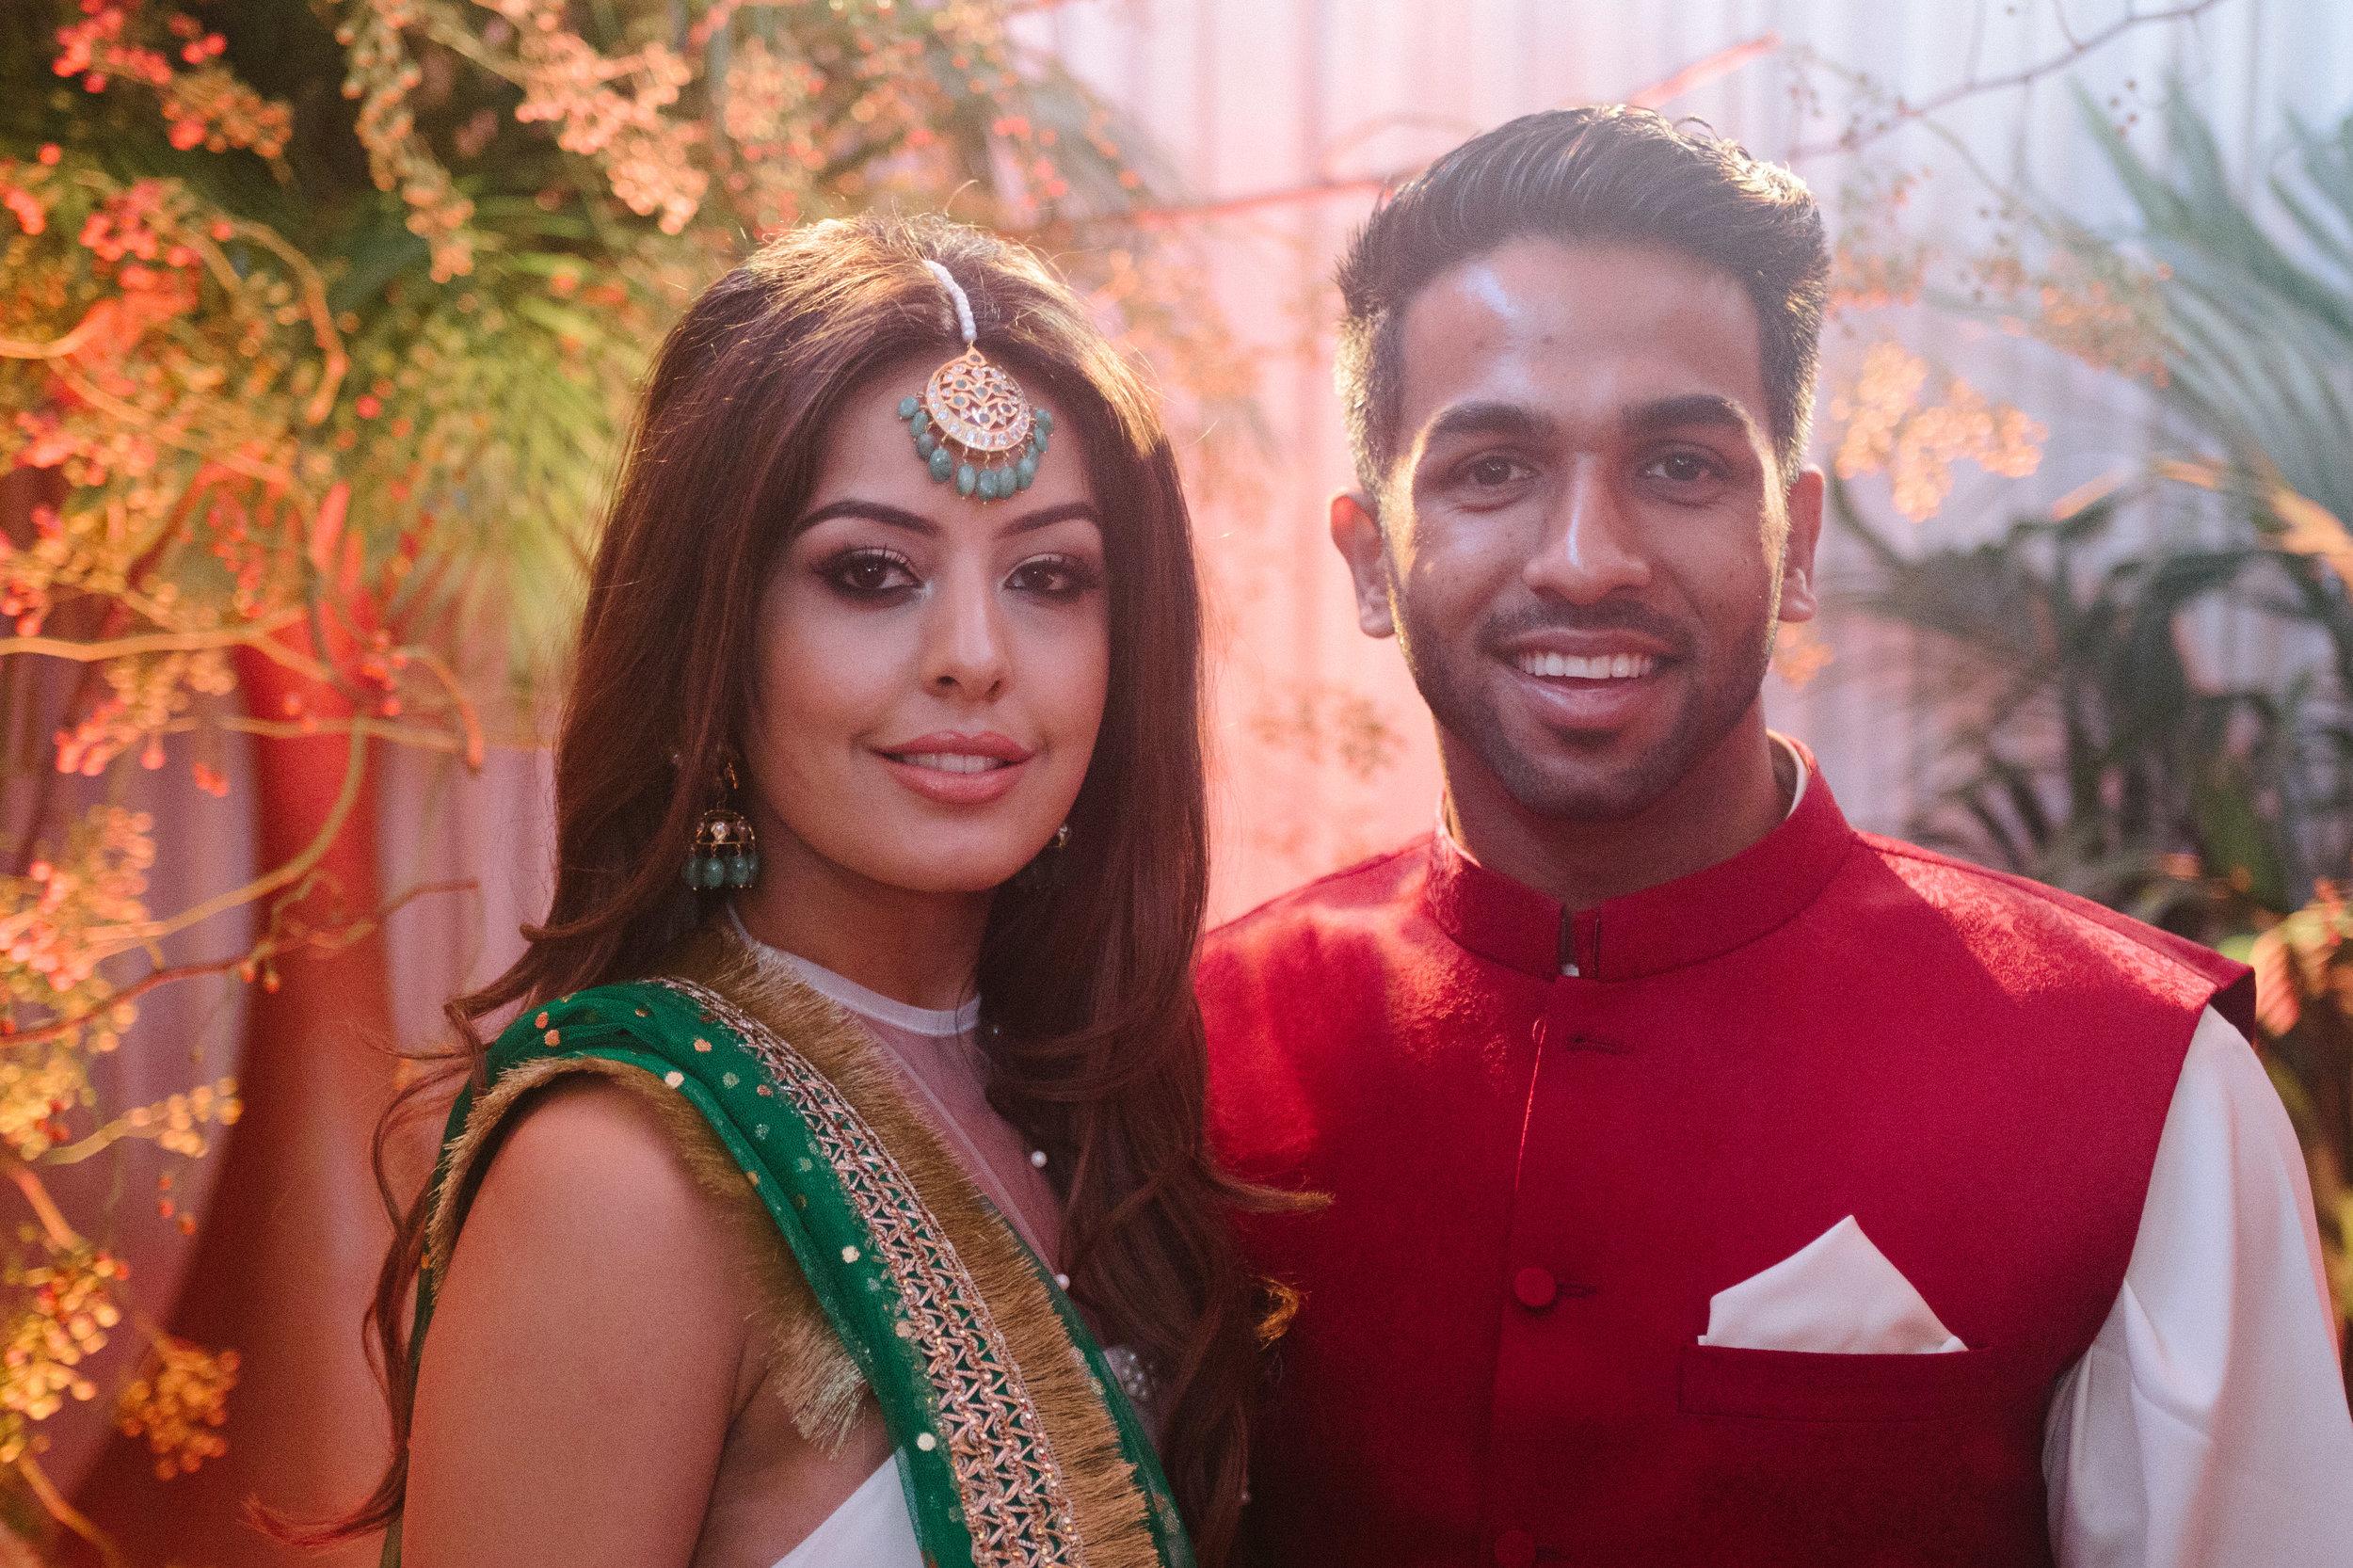 alternative asian Mehndi and wedding in Tatton Park - Michael Newington Gray-21.jpg